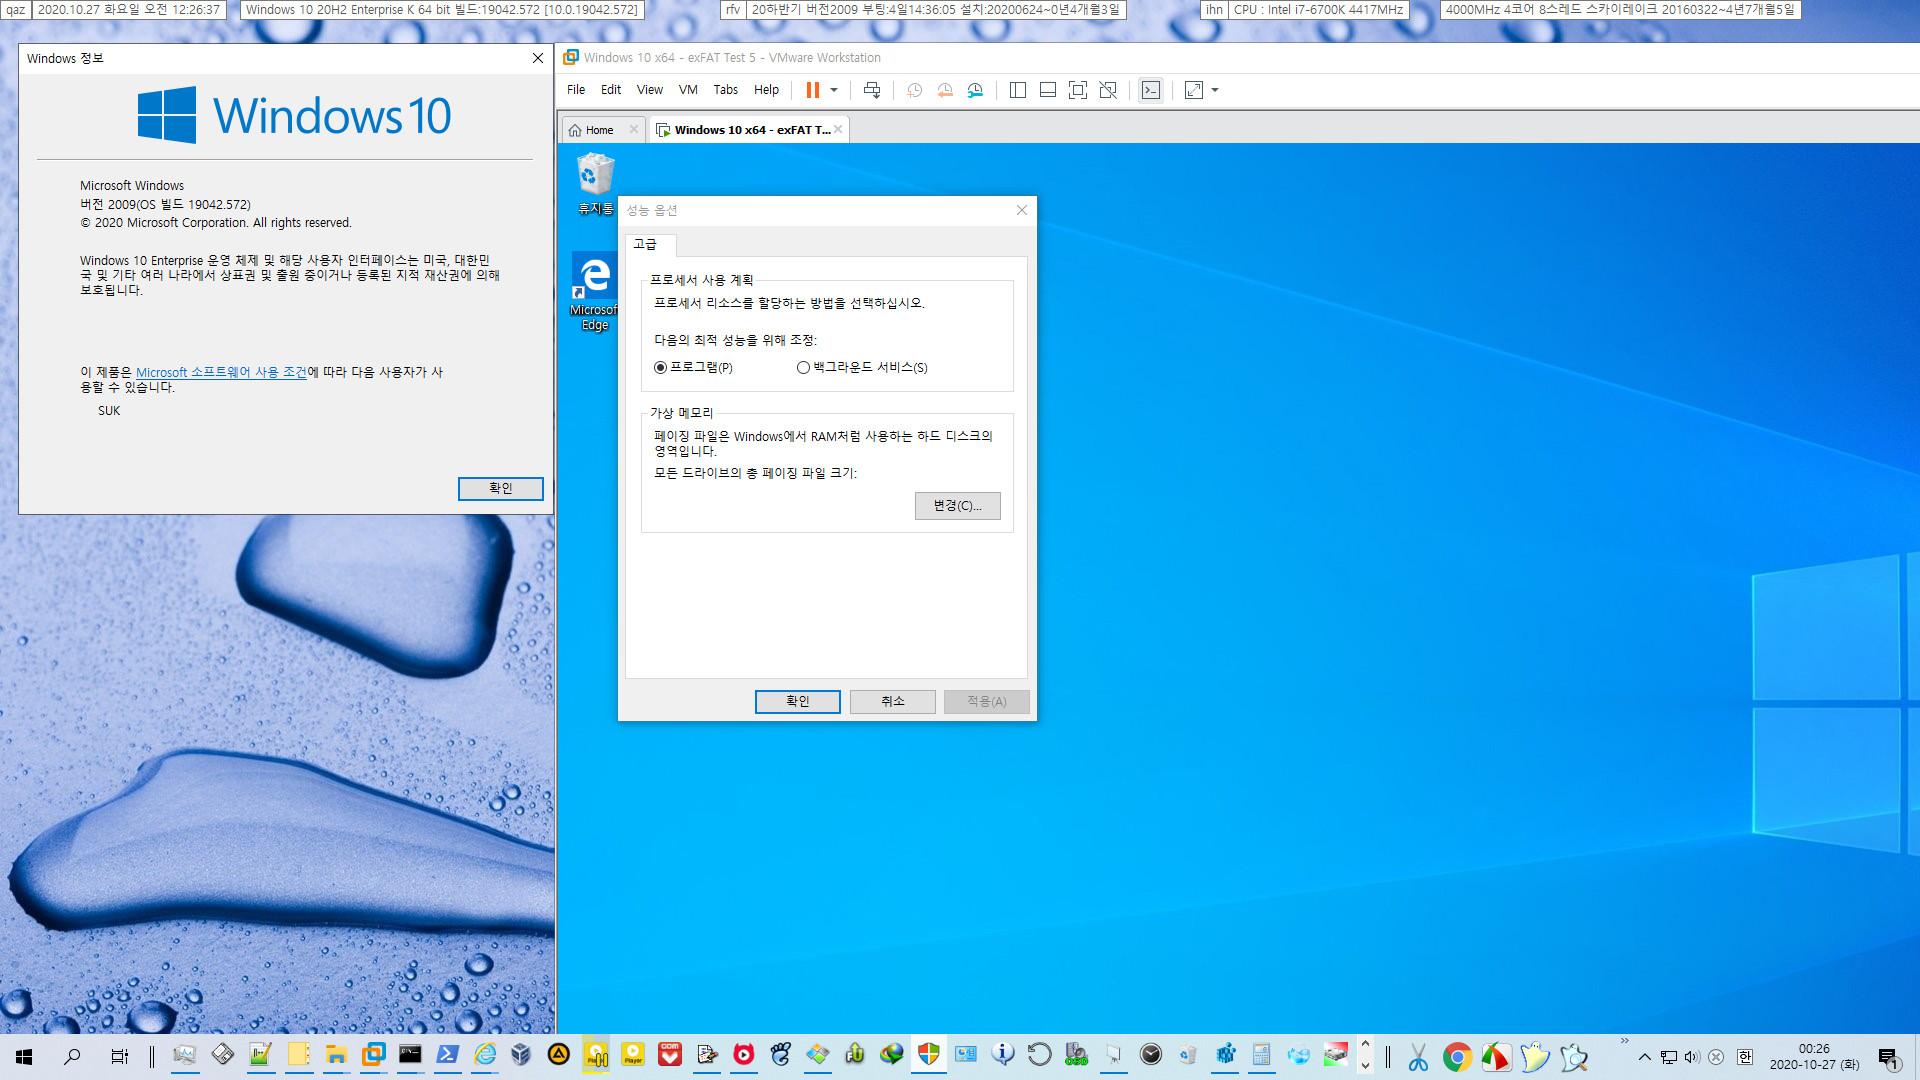 exFAT 포맷으로도 VHD 부팅이 Windows 10 버전 1903부터 된다고 하여 테스트 - 생고생만 하다가 컴퓨터 먹통 2번이나 되고 그만뒀습니다 2020-10-27_002637.jpg